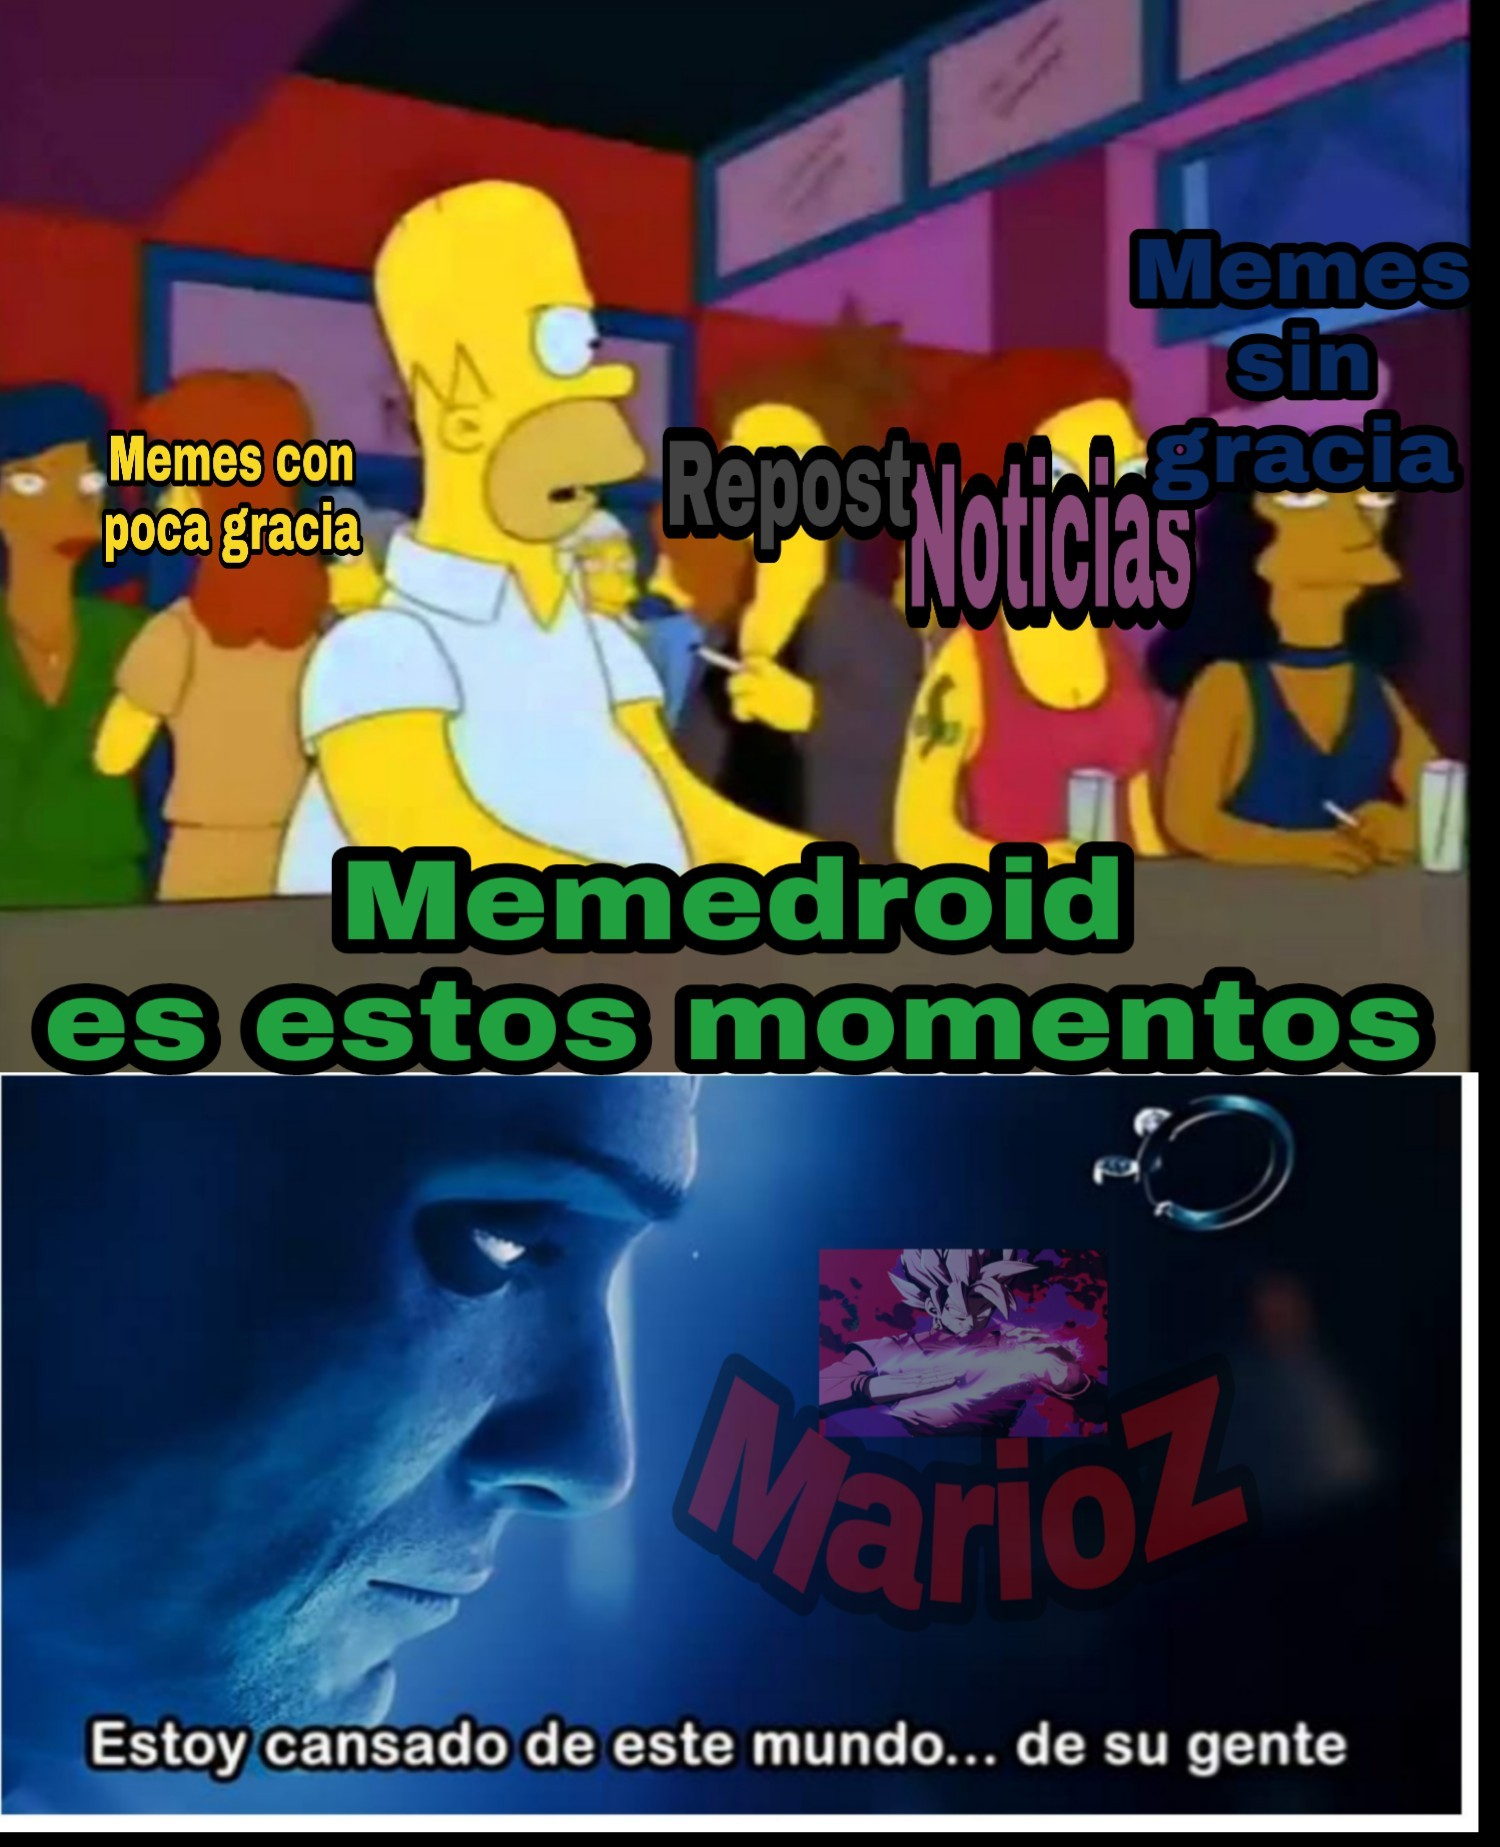 Triste pero verdad - meme